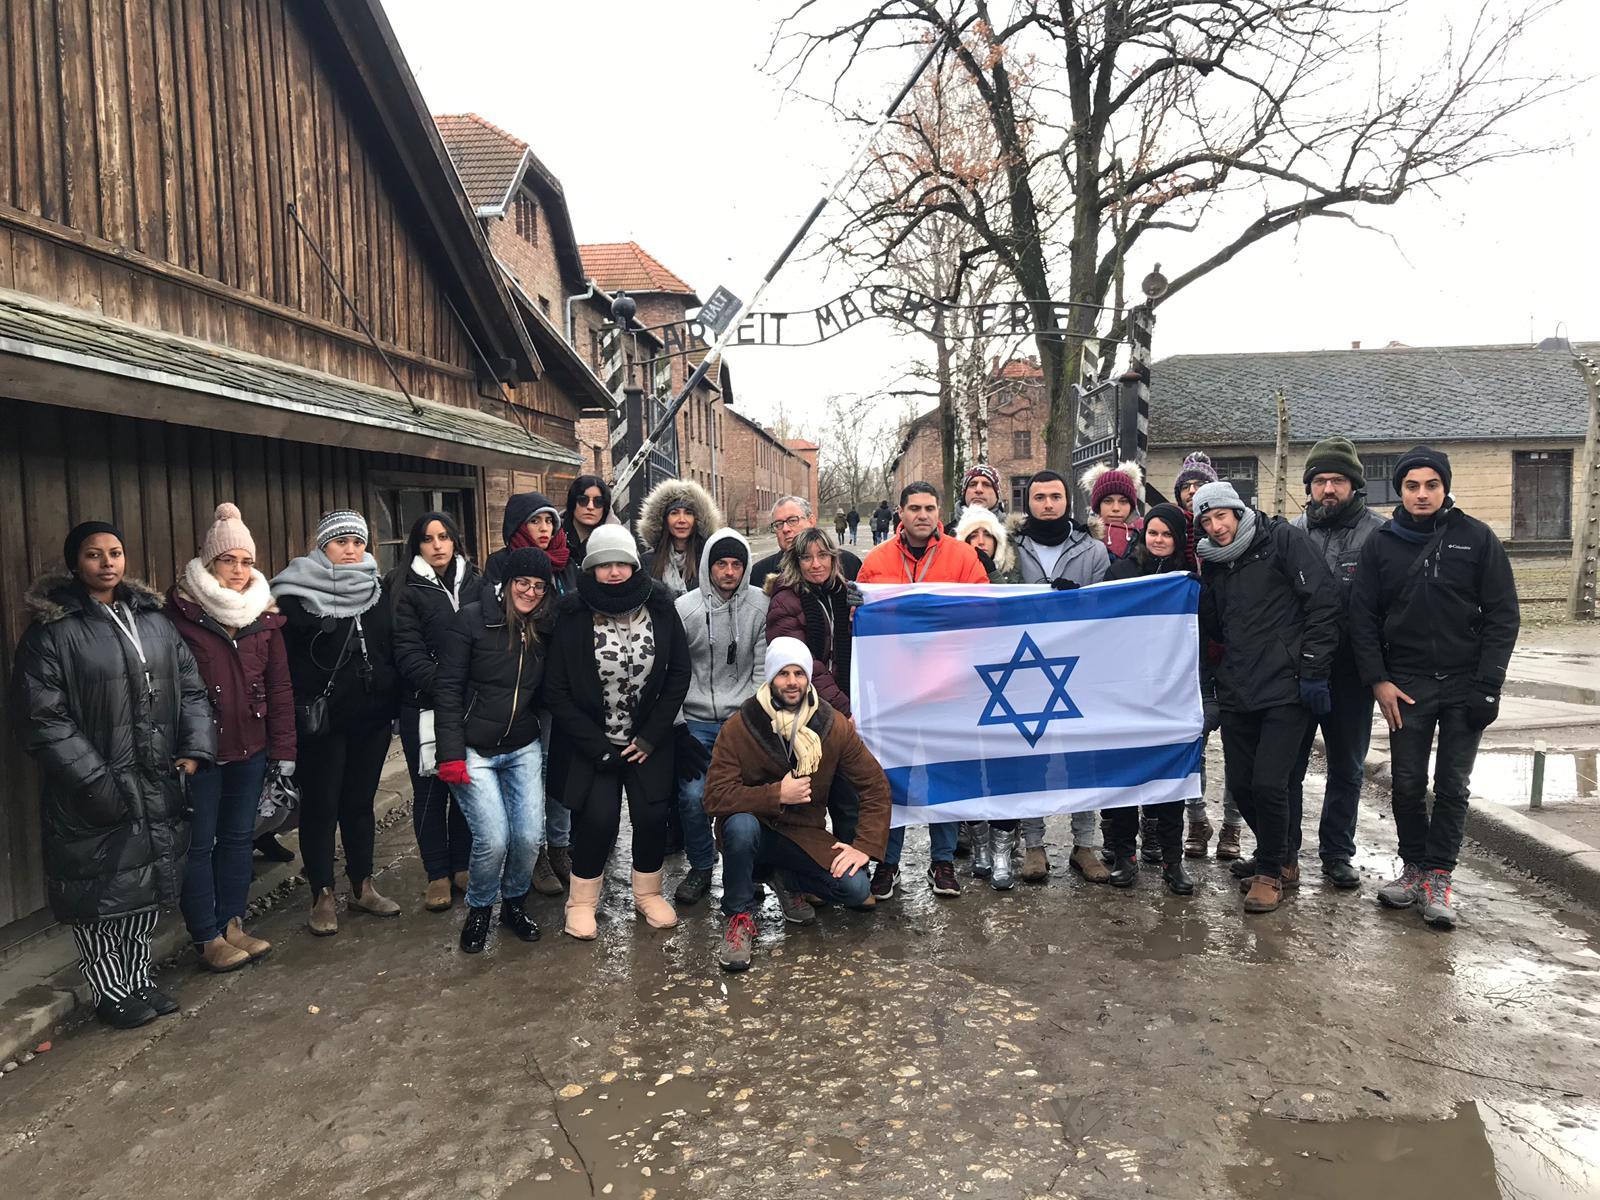 Photo of נציגי המשלחת השנתית לפולין של אגודת הסטודנטיות והסטודנטים של האוניברסיטה הפתוחה חזרו נרגשים ועמוסים חוויות מטלטלות